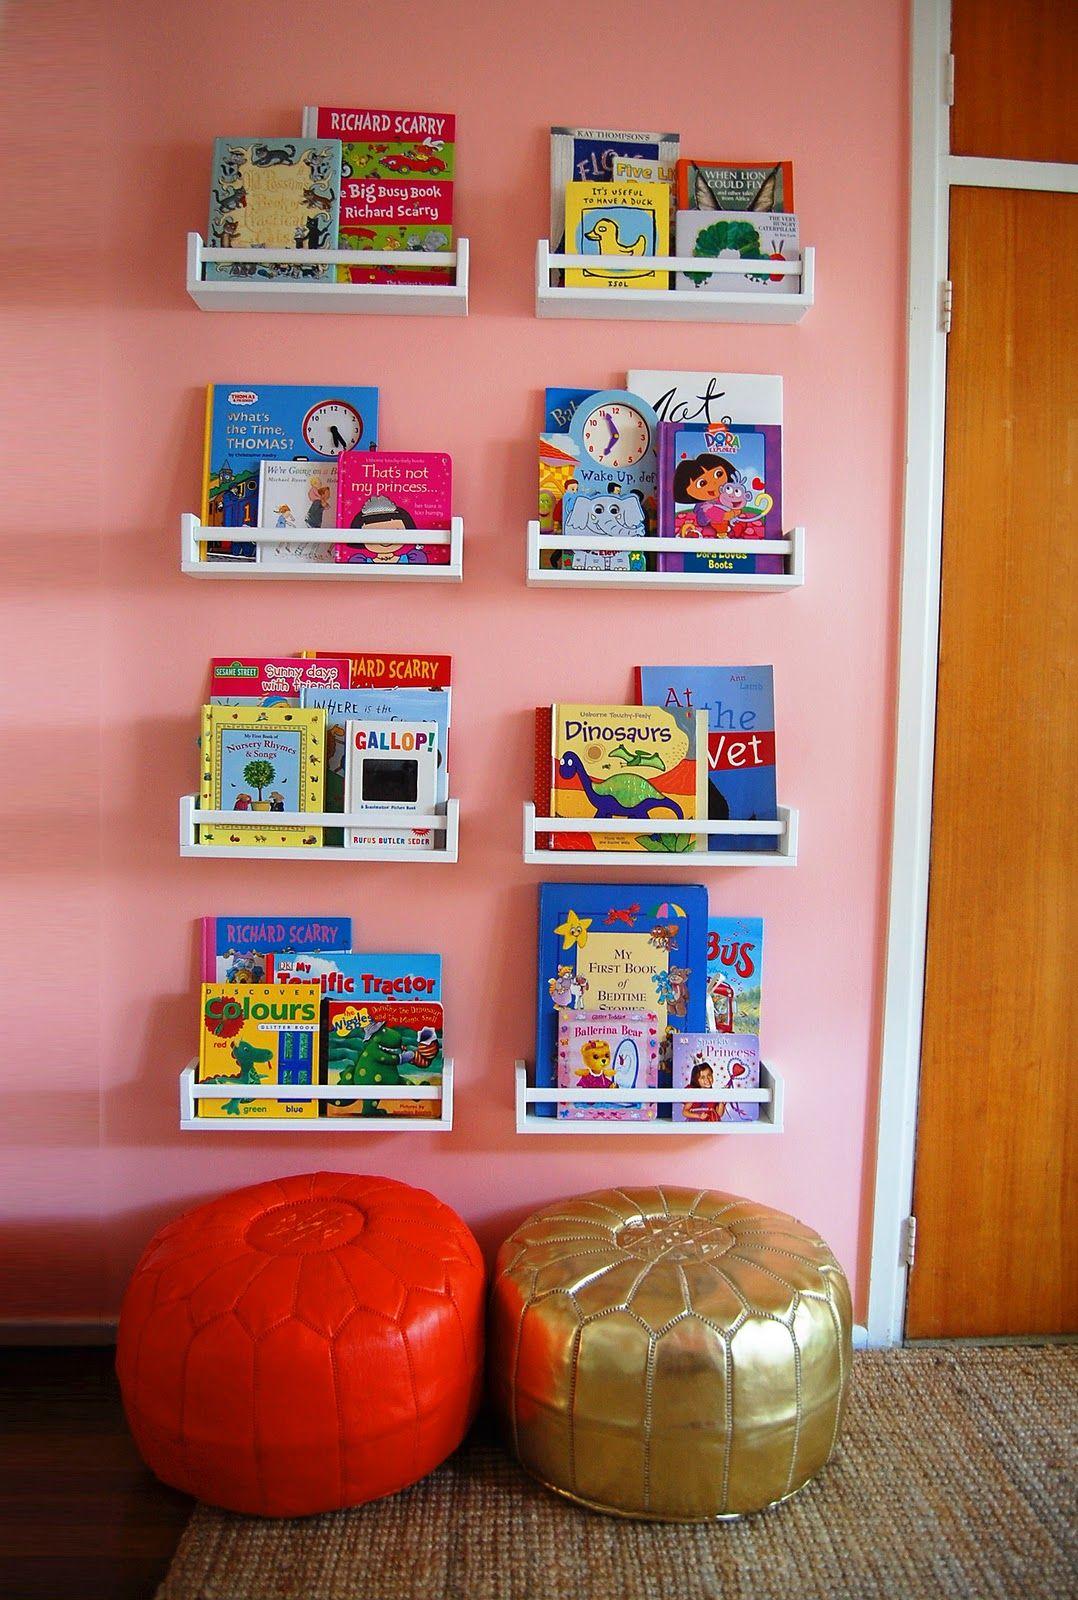 genius turn a 2 spice rack into book shelves ikea spice rack